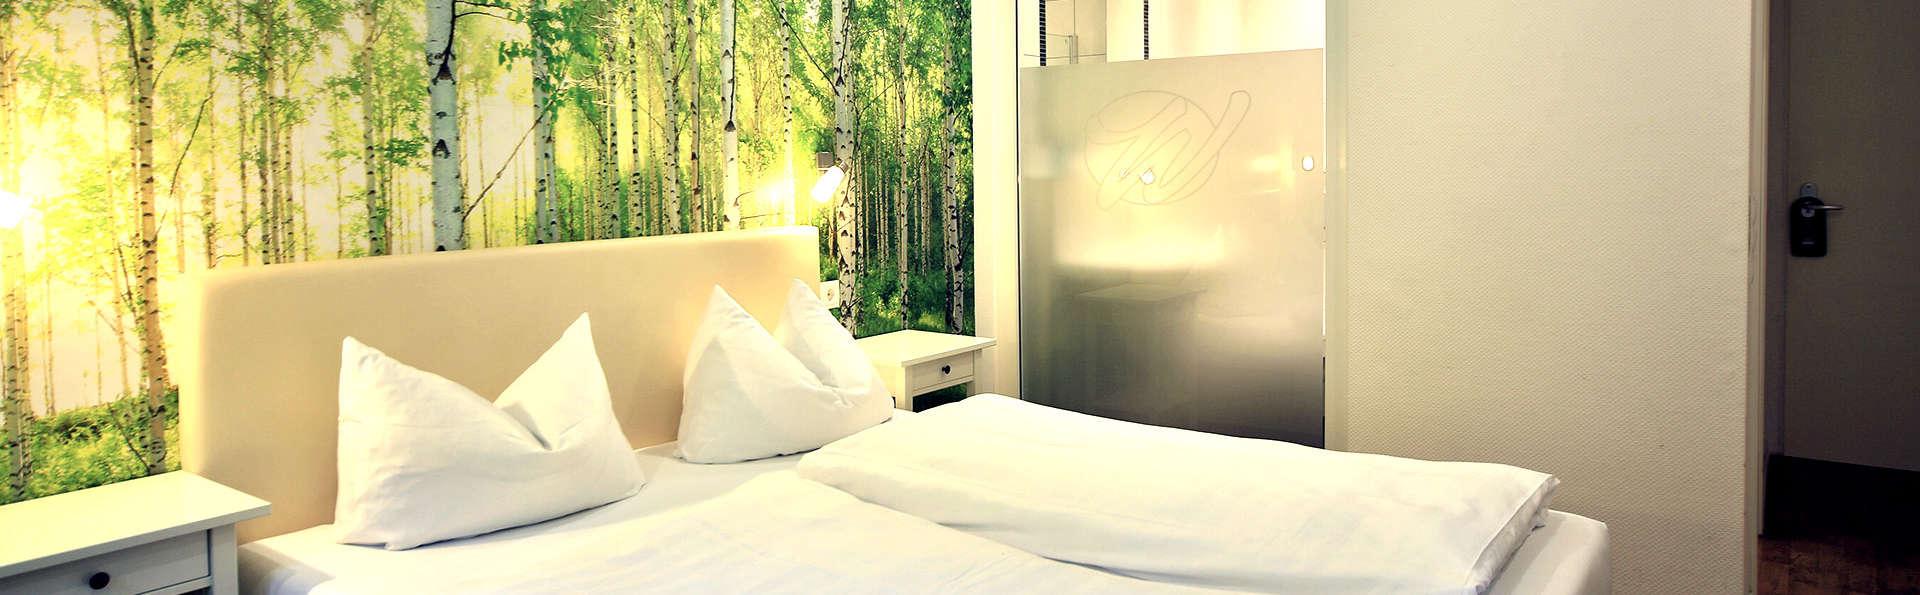 Landidyll Hotel Weidenbrück - EDIT_NEW_ROOM2.jpg